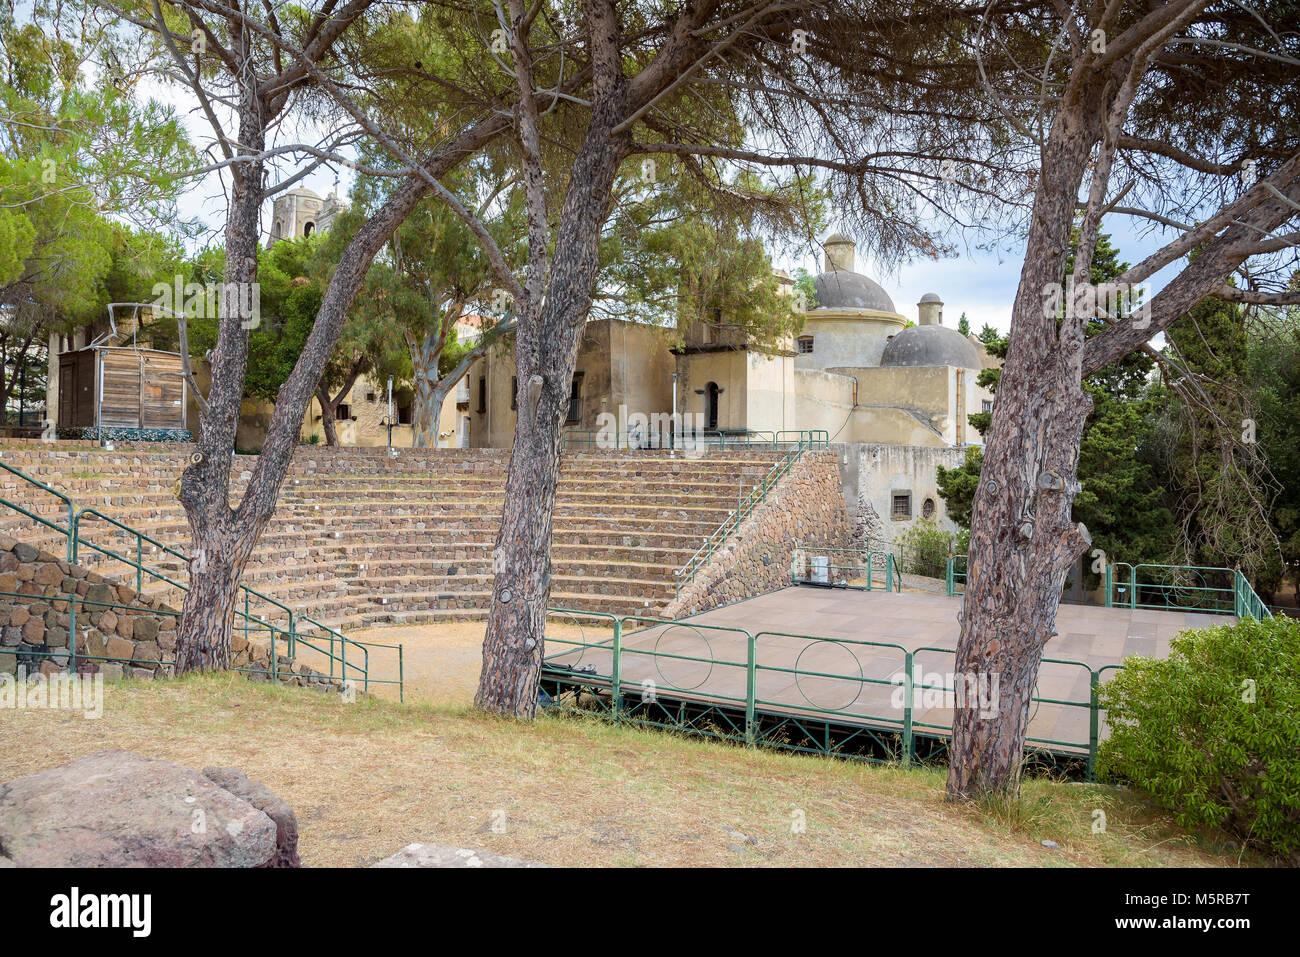 The ancient greek theater on Lipari Island, Aeolian Islands, Italy Stock Photo